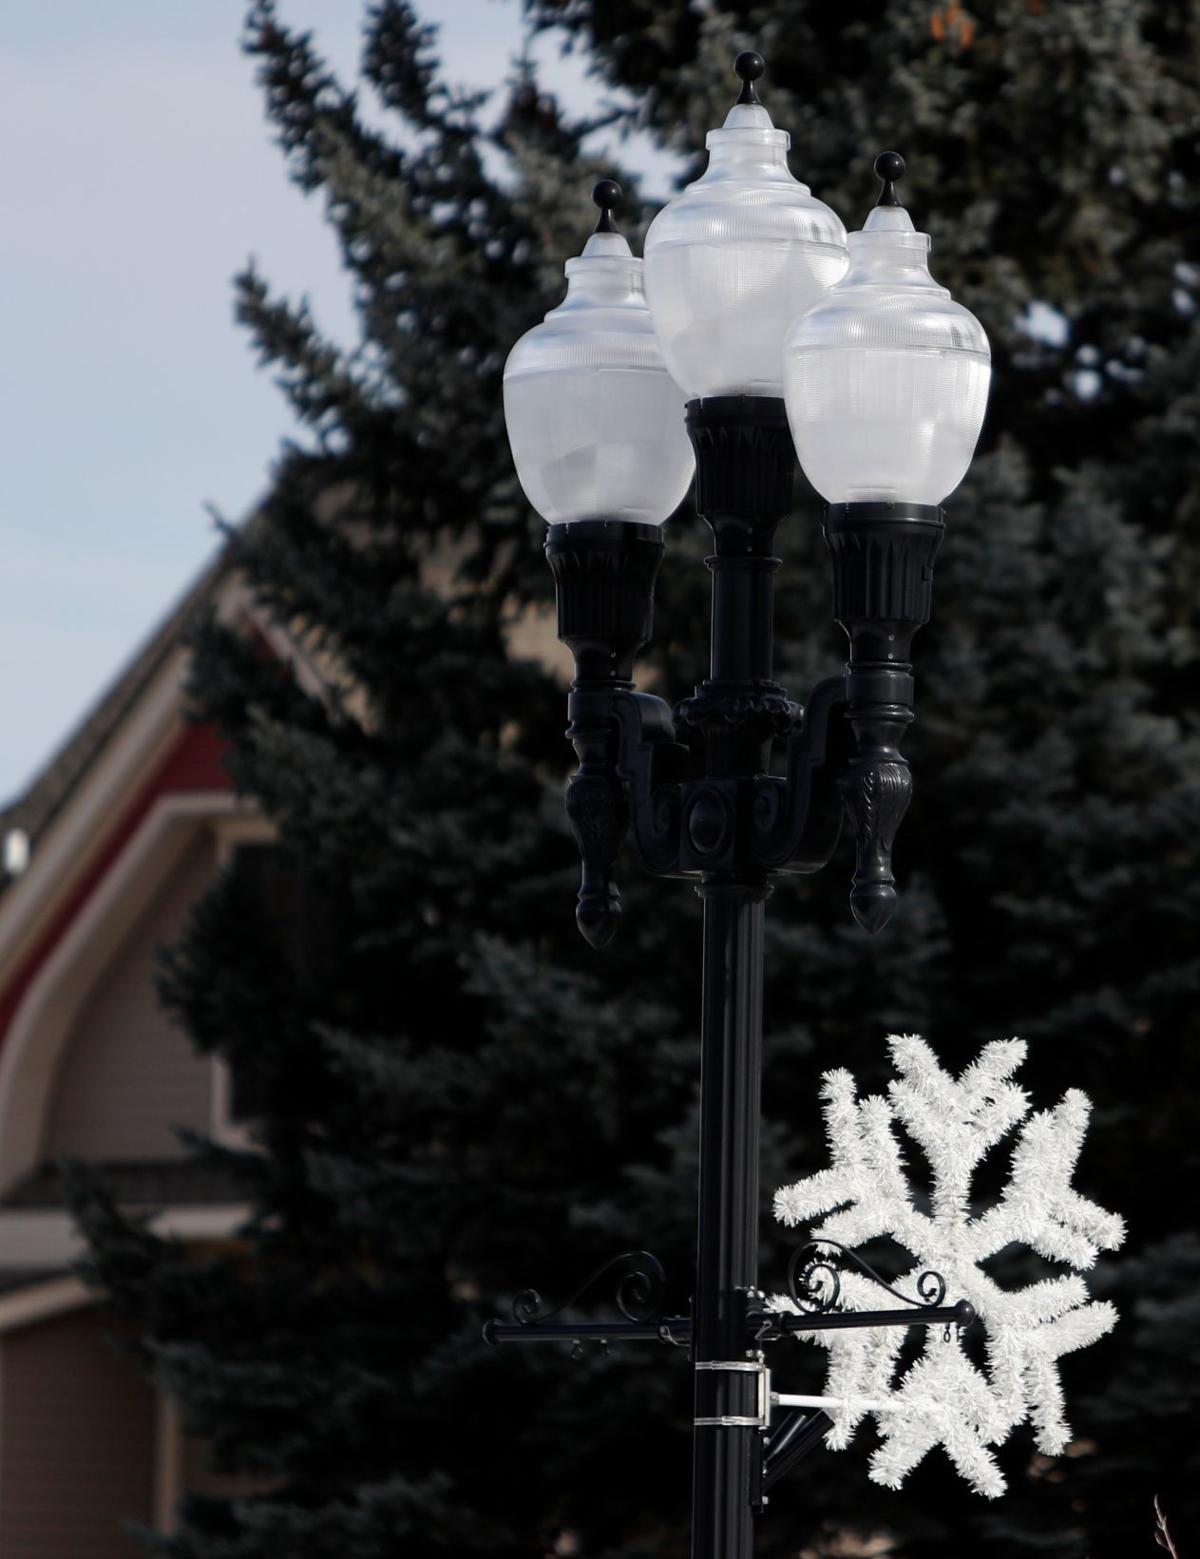 New LED street lights